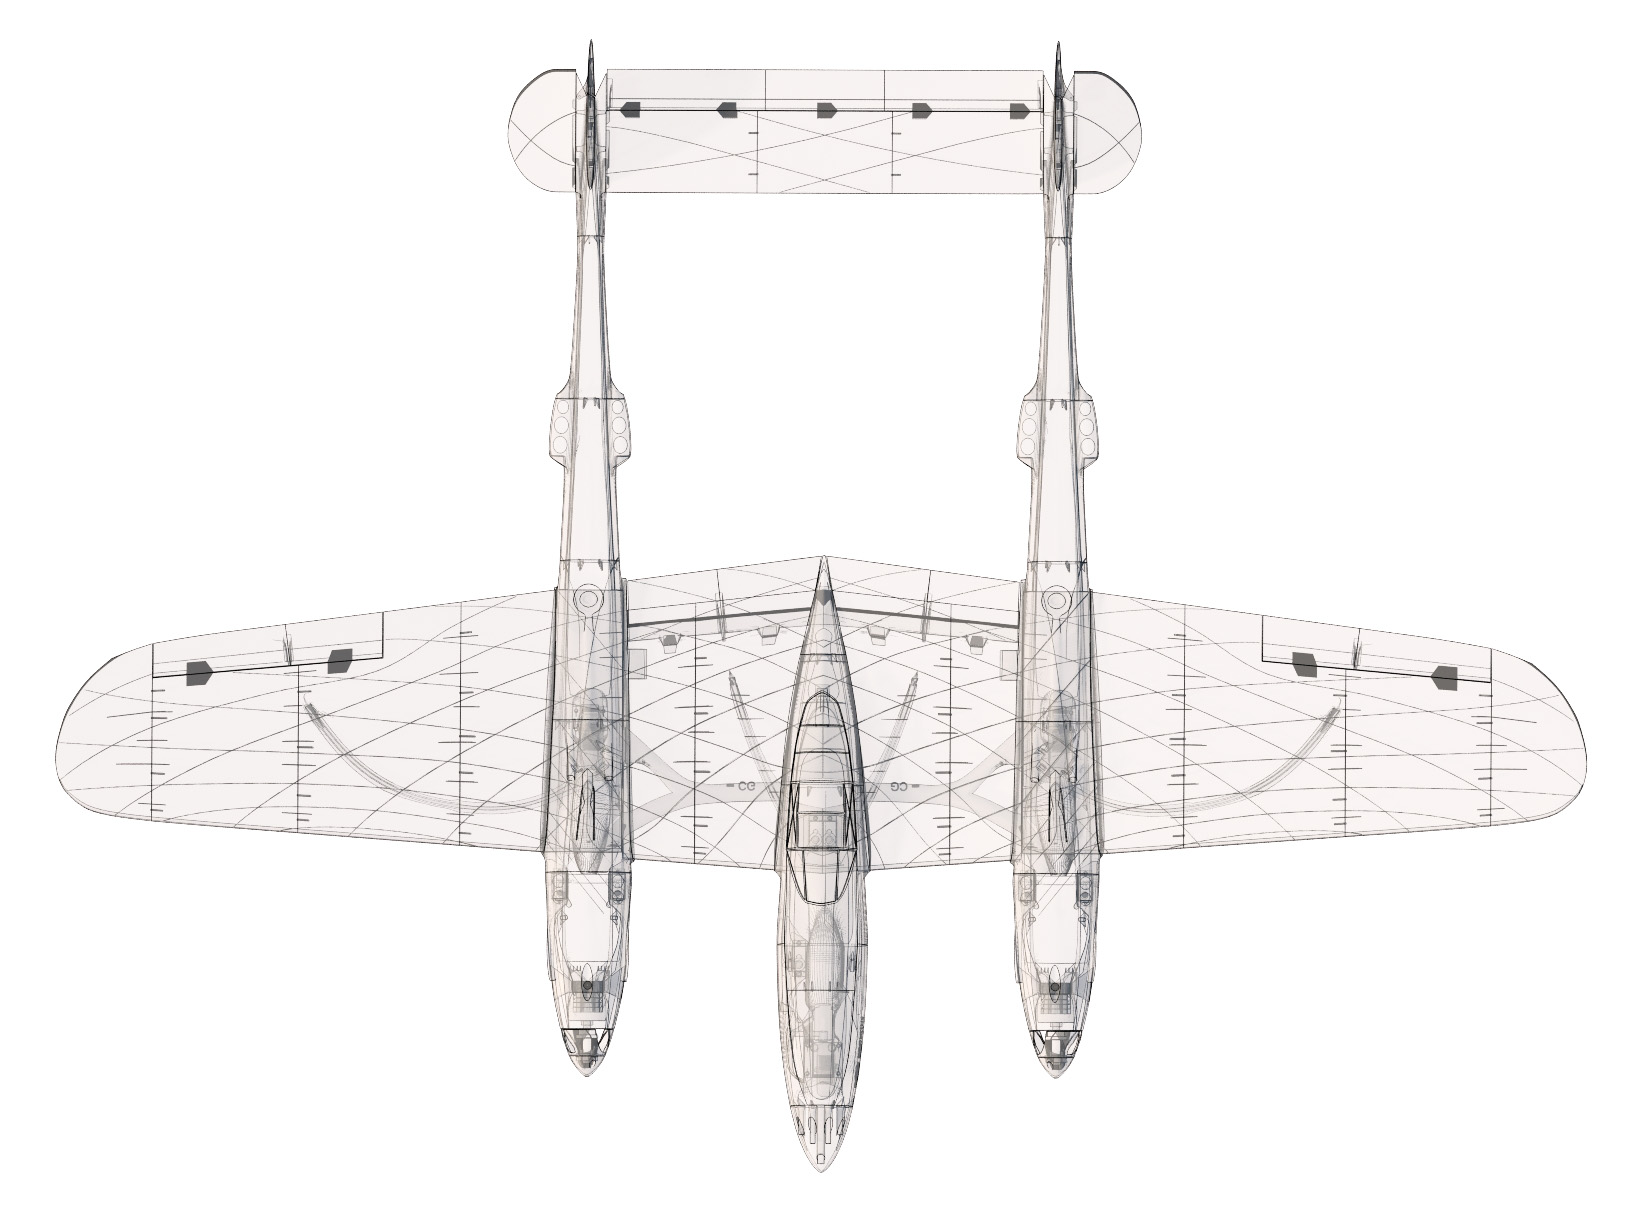 Lockheed P 38 Lightning 3dlabprint